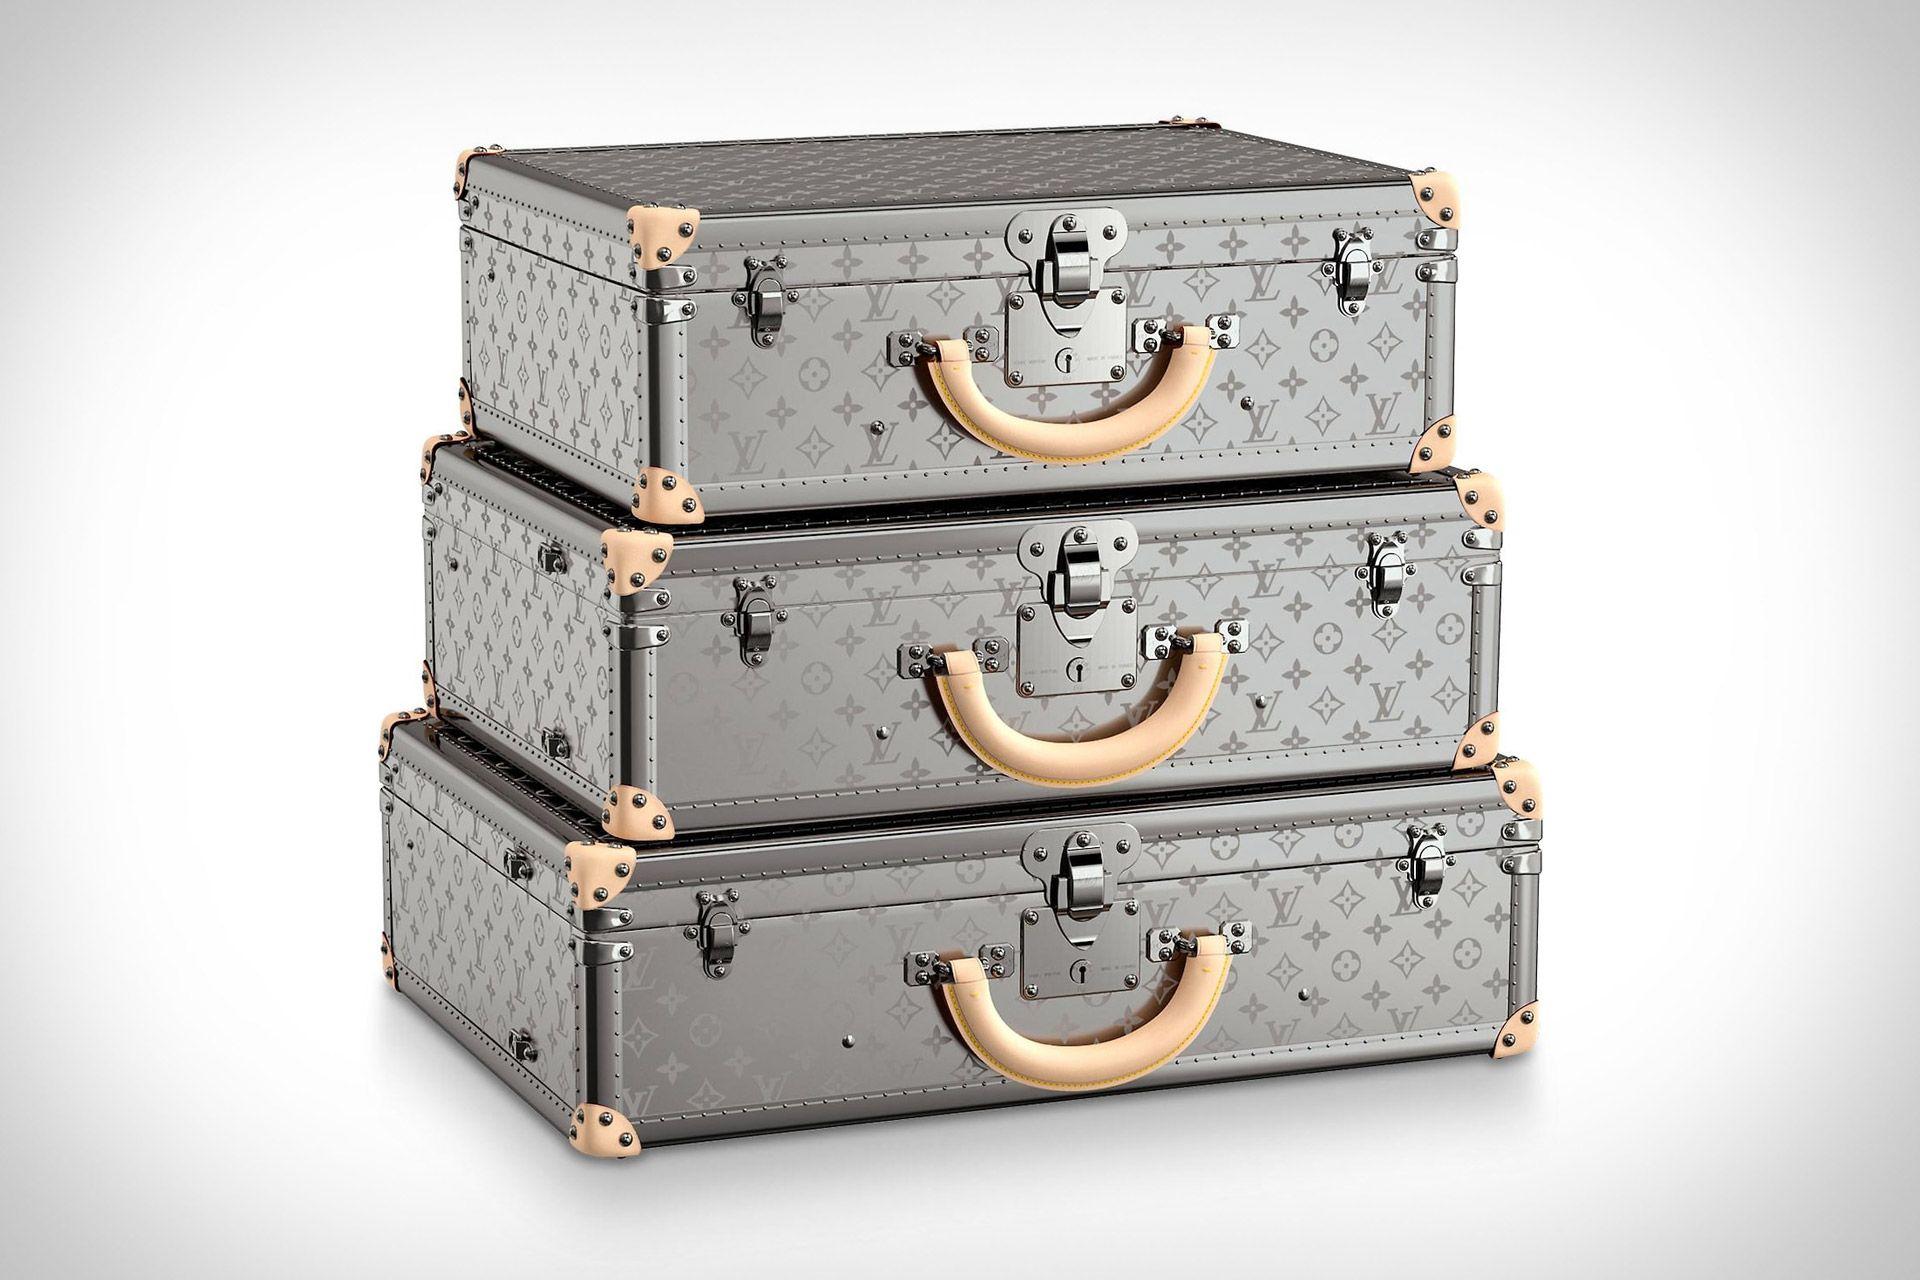 Louis Vuitton Monogram Titane Luggage Collection | På